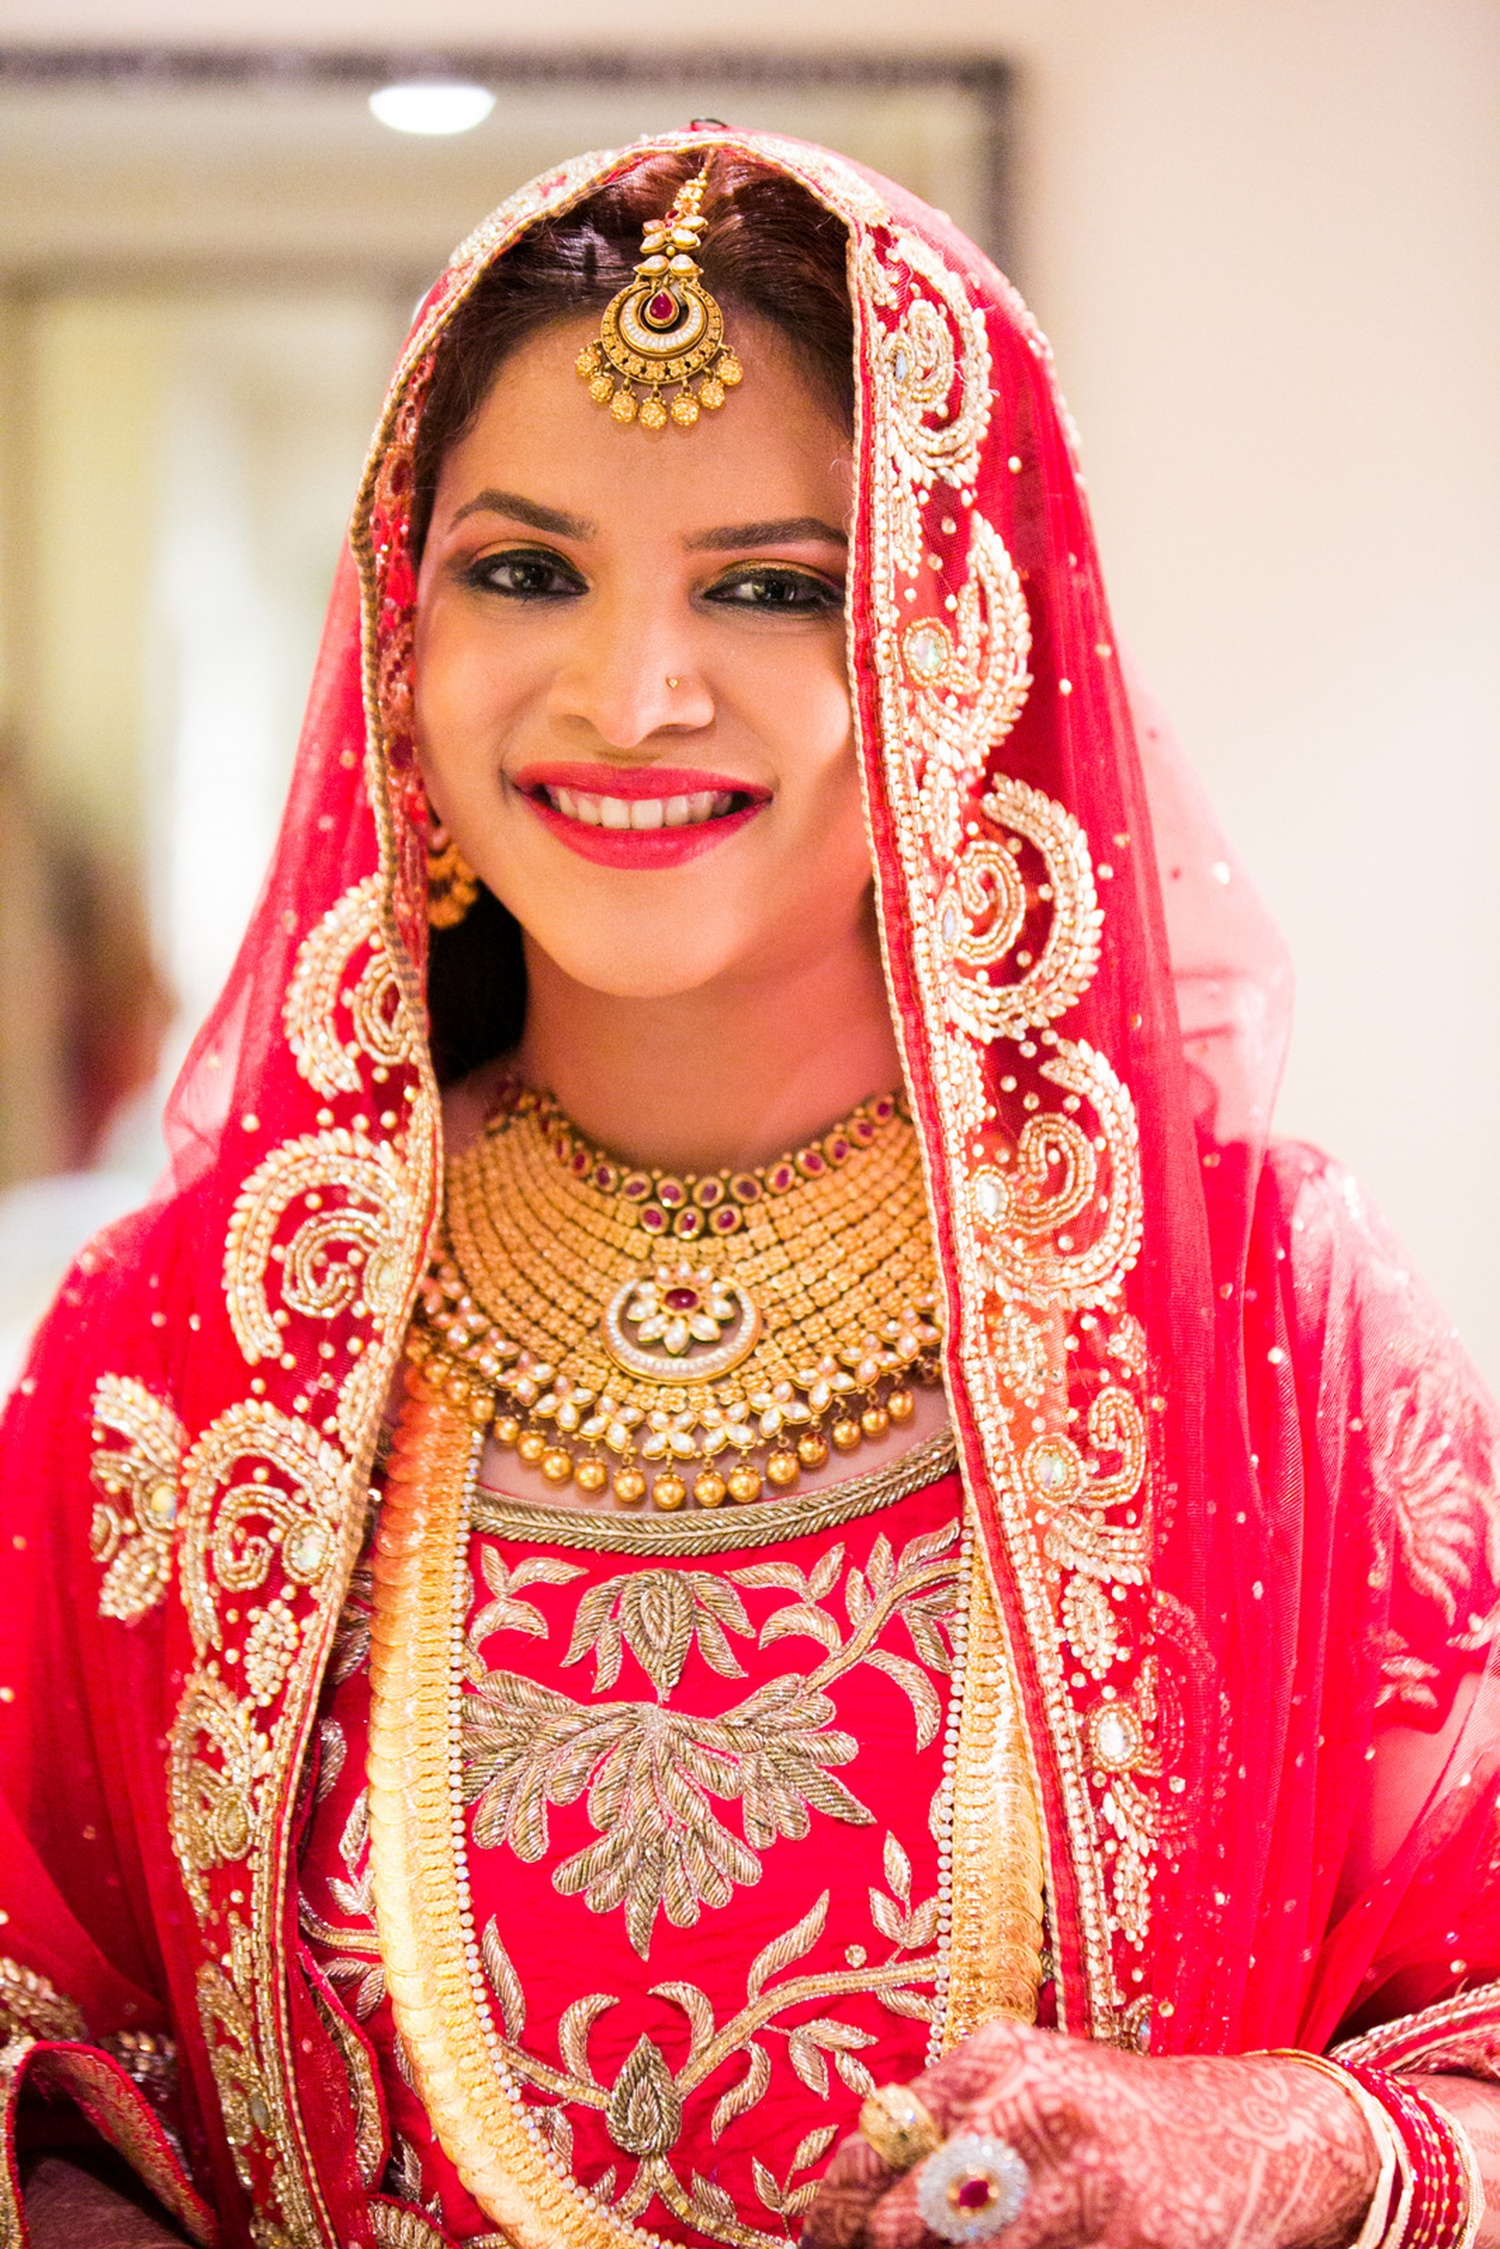 Queens Bridal, Bridal Makeup Artist in Bangalore   WeddingZ